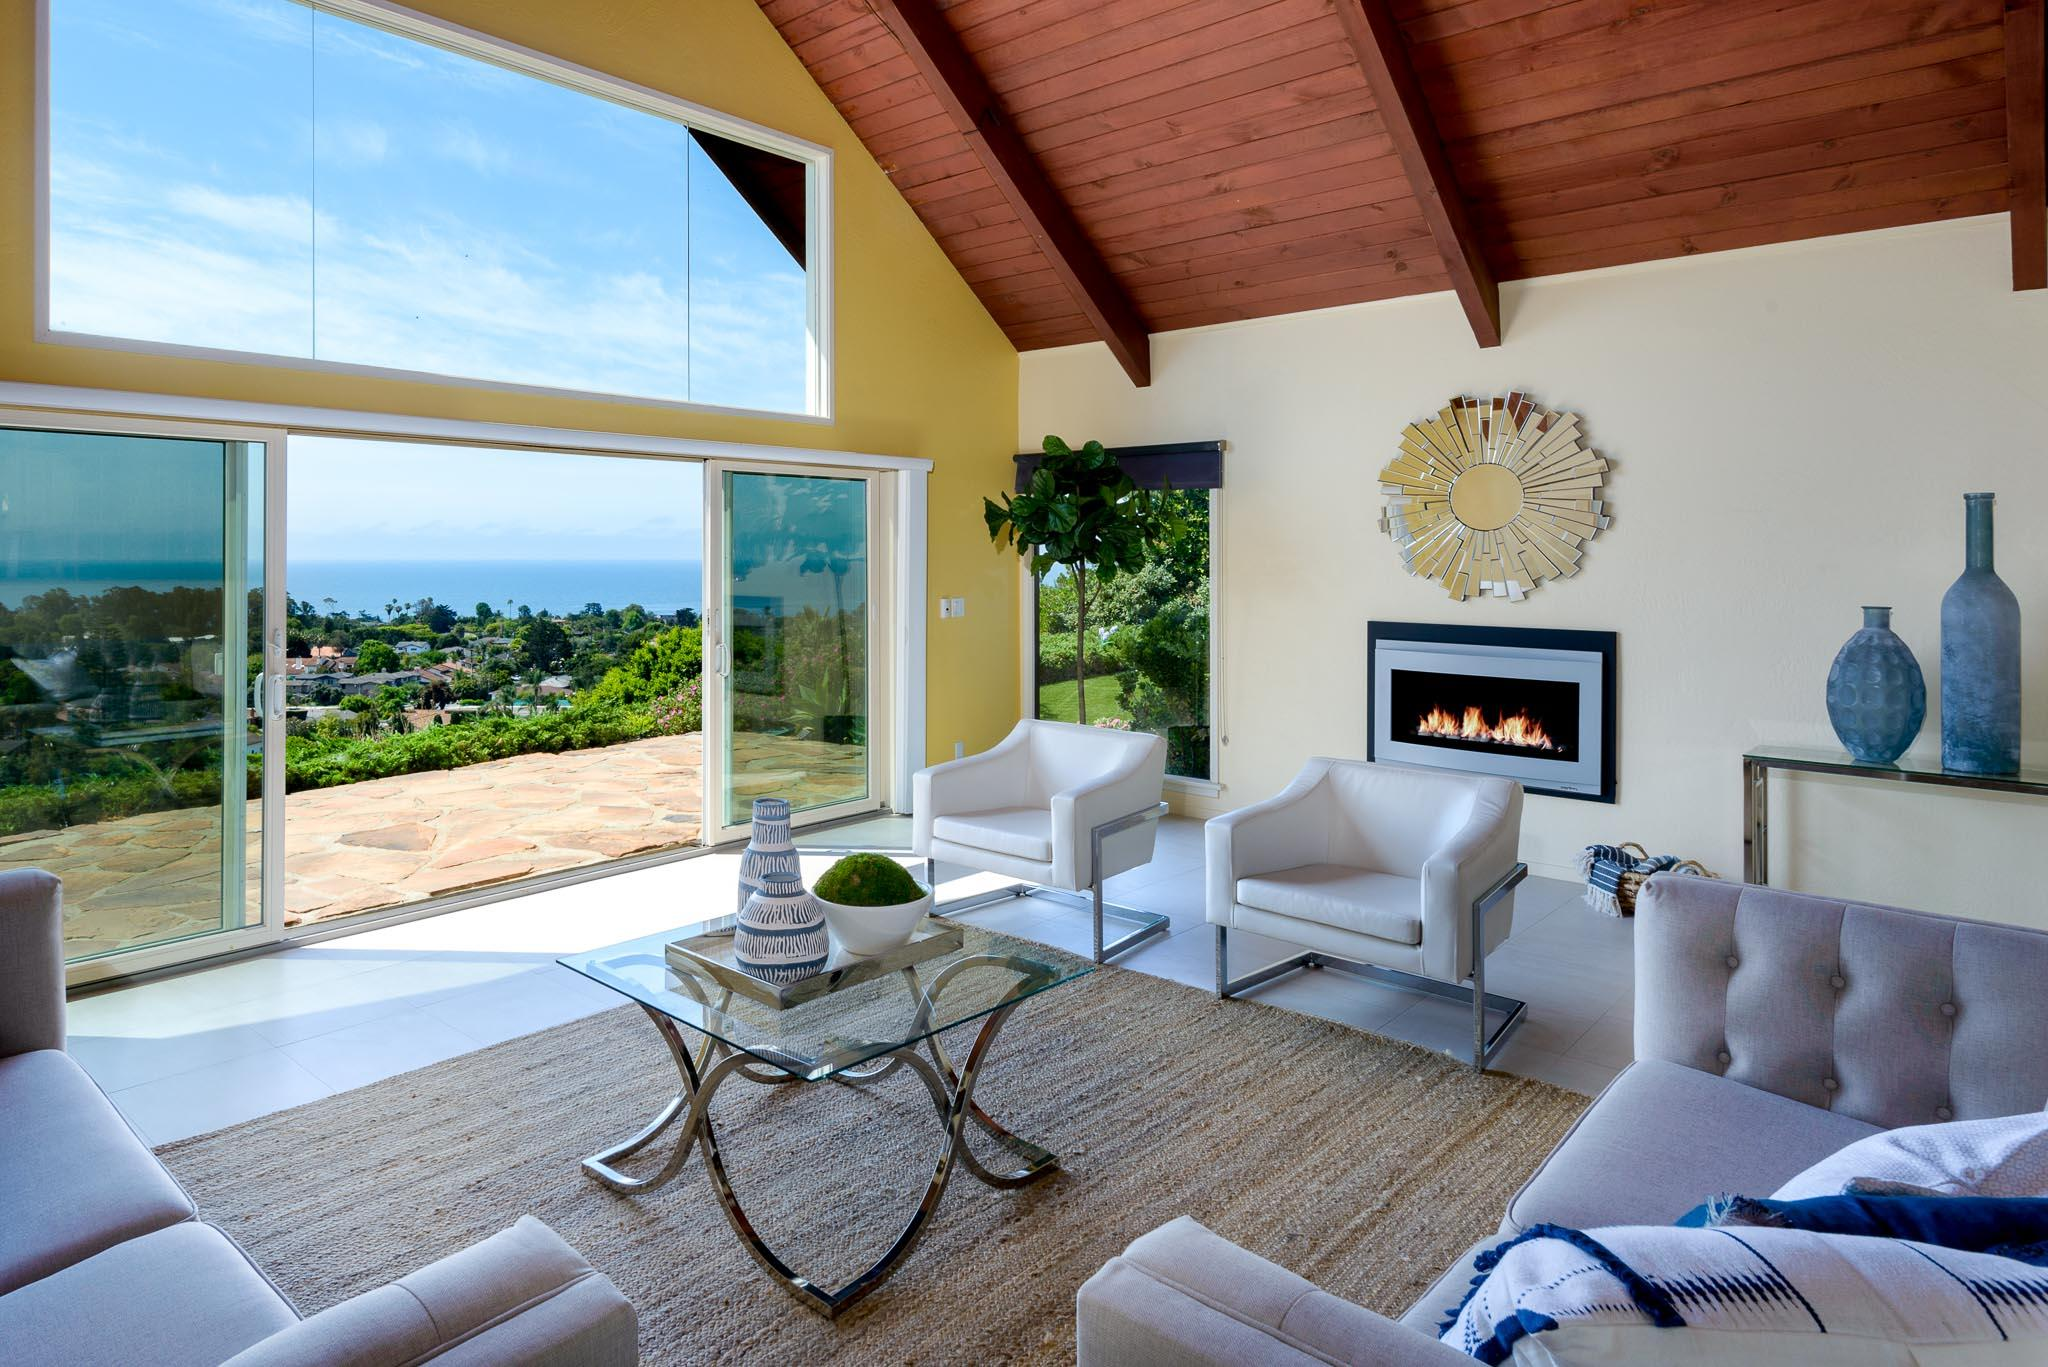 Property photo for 608 Litchfield Ln Santa Barbara, California 93109 - 18-2595